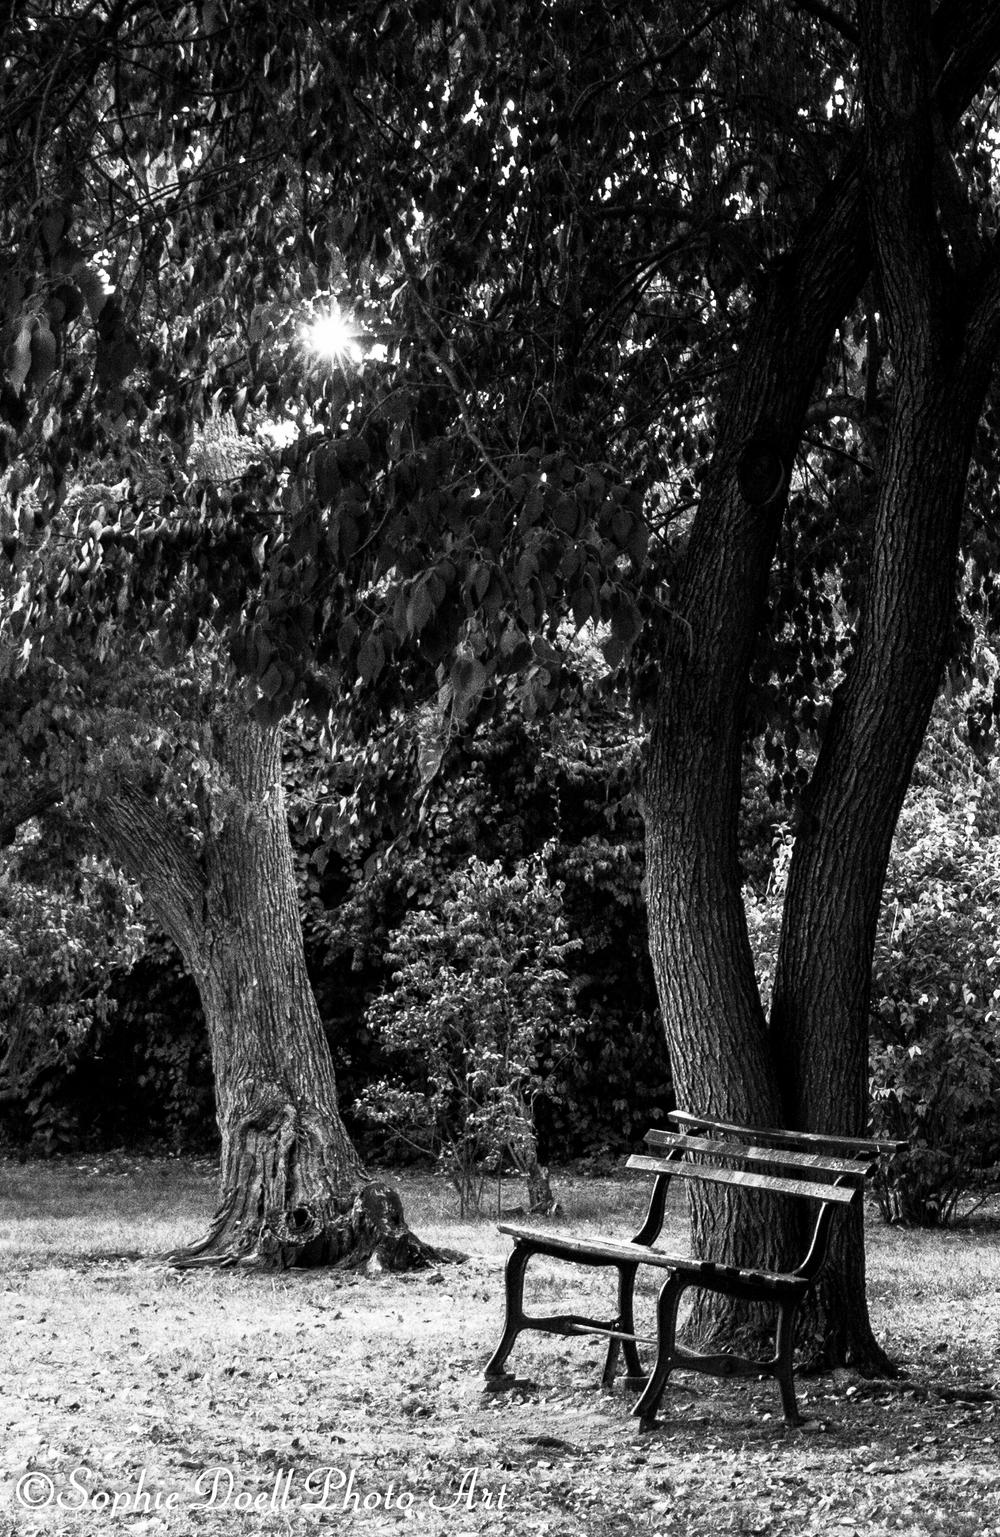 Holcomb_Gardens_08292013-closeup-2629.jpg